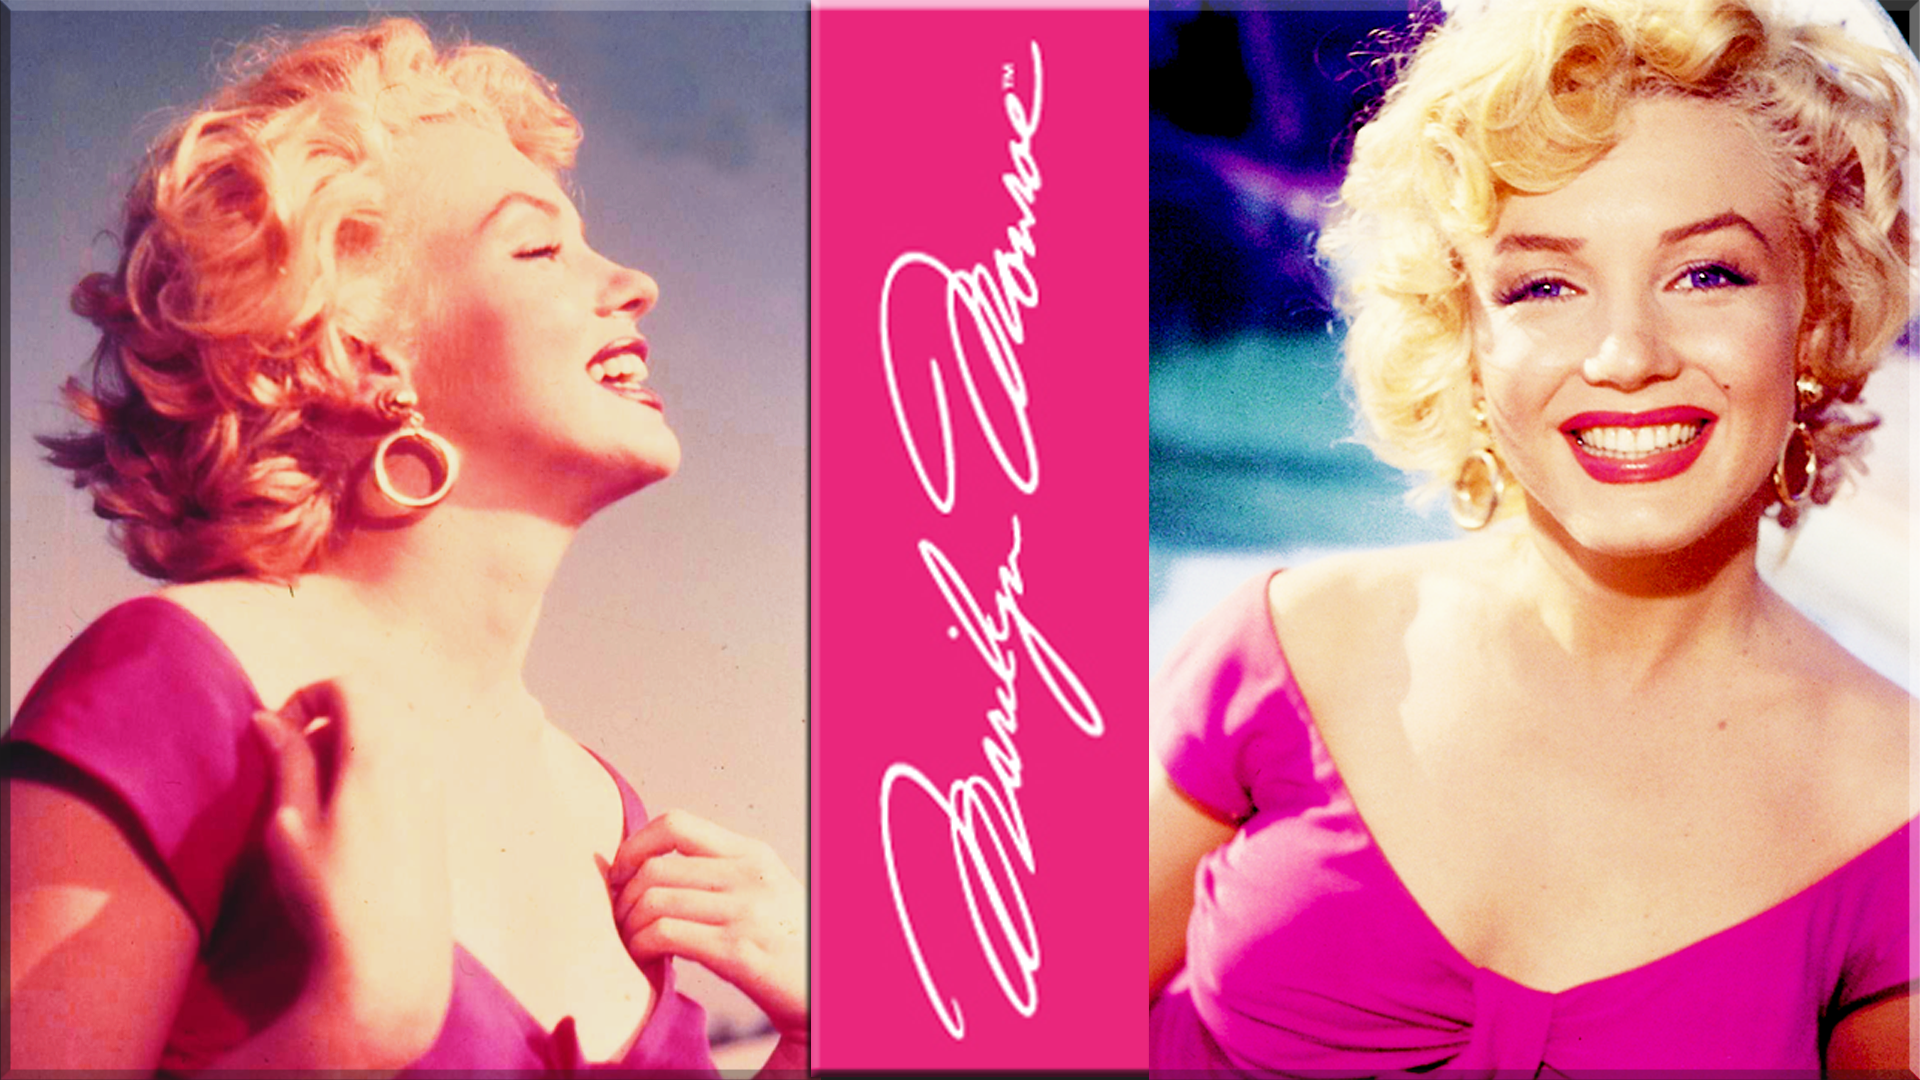 Marilyn monroe in pink computer wallpapers desktop backgrounds 1920x1080 id 351072 - Marilyn monroe wallpaper download ...